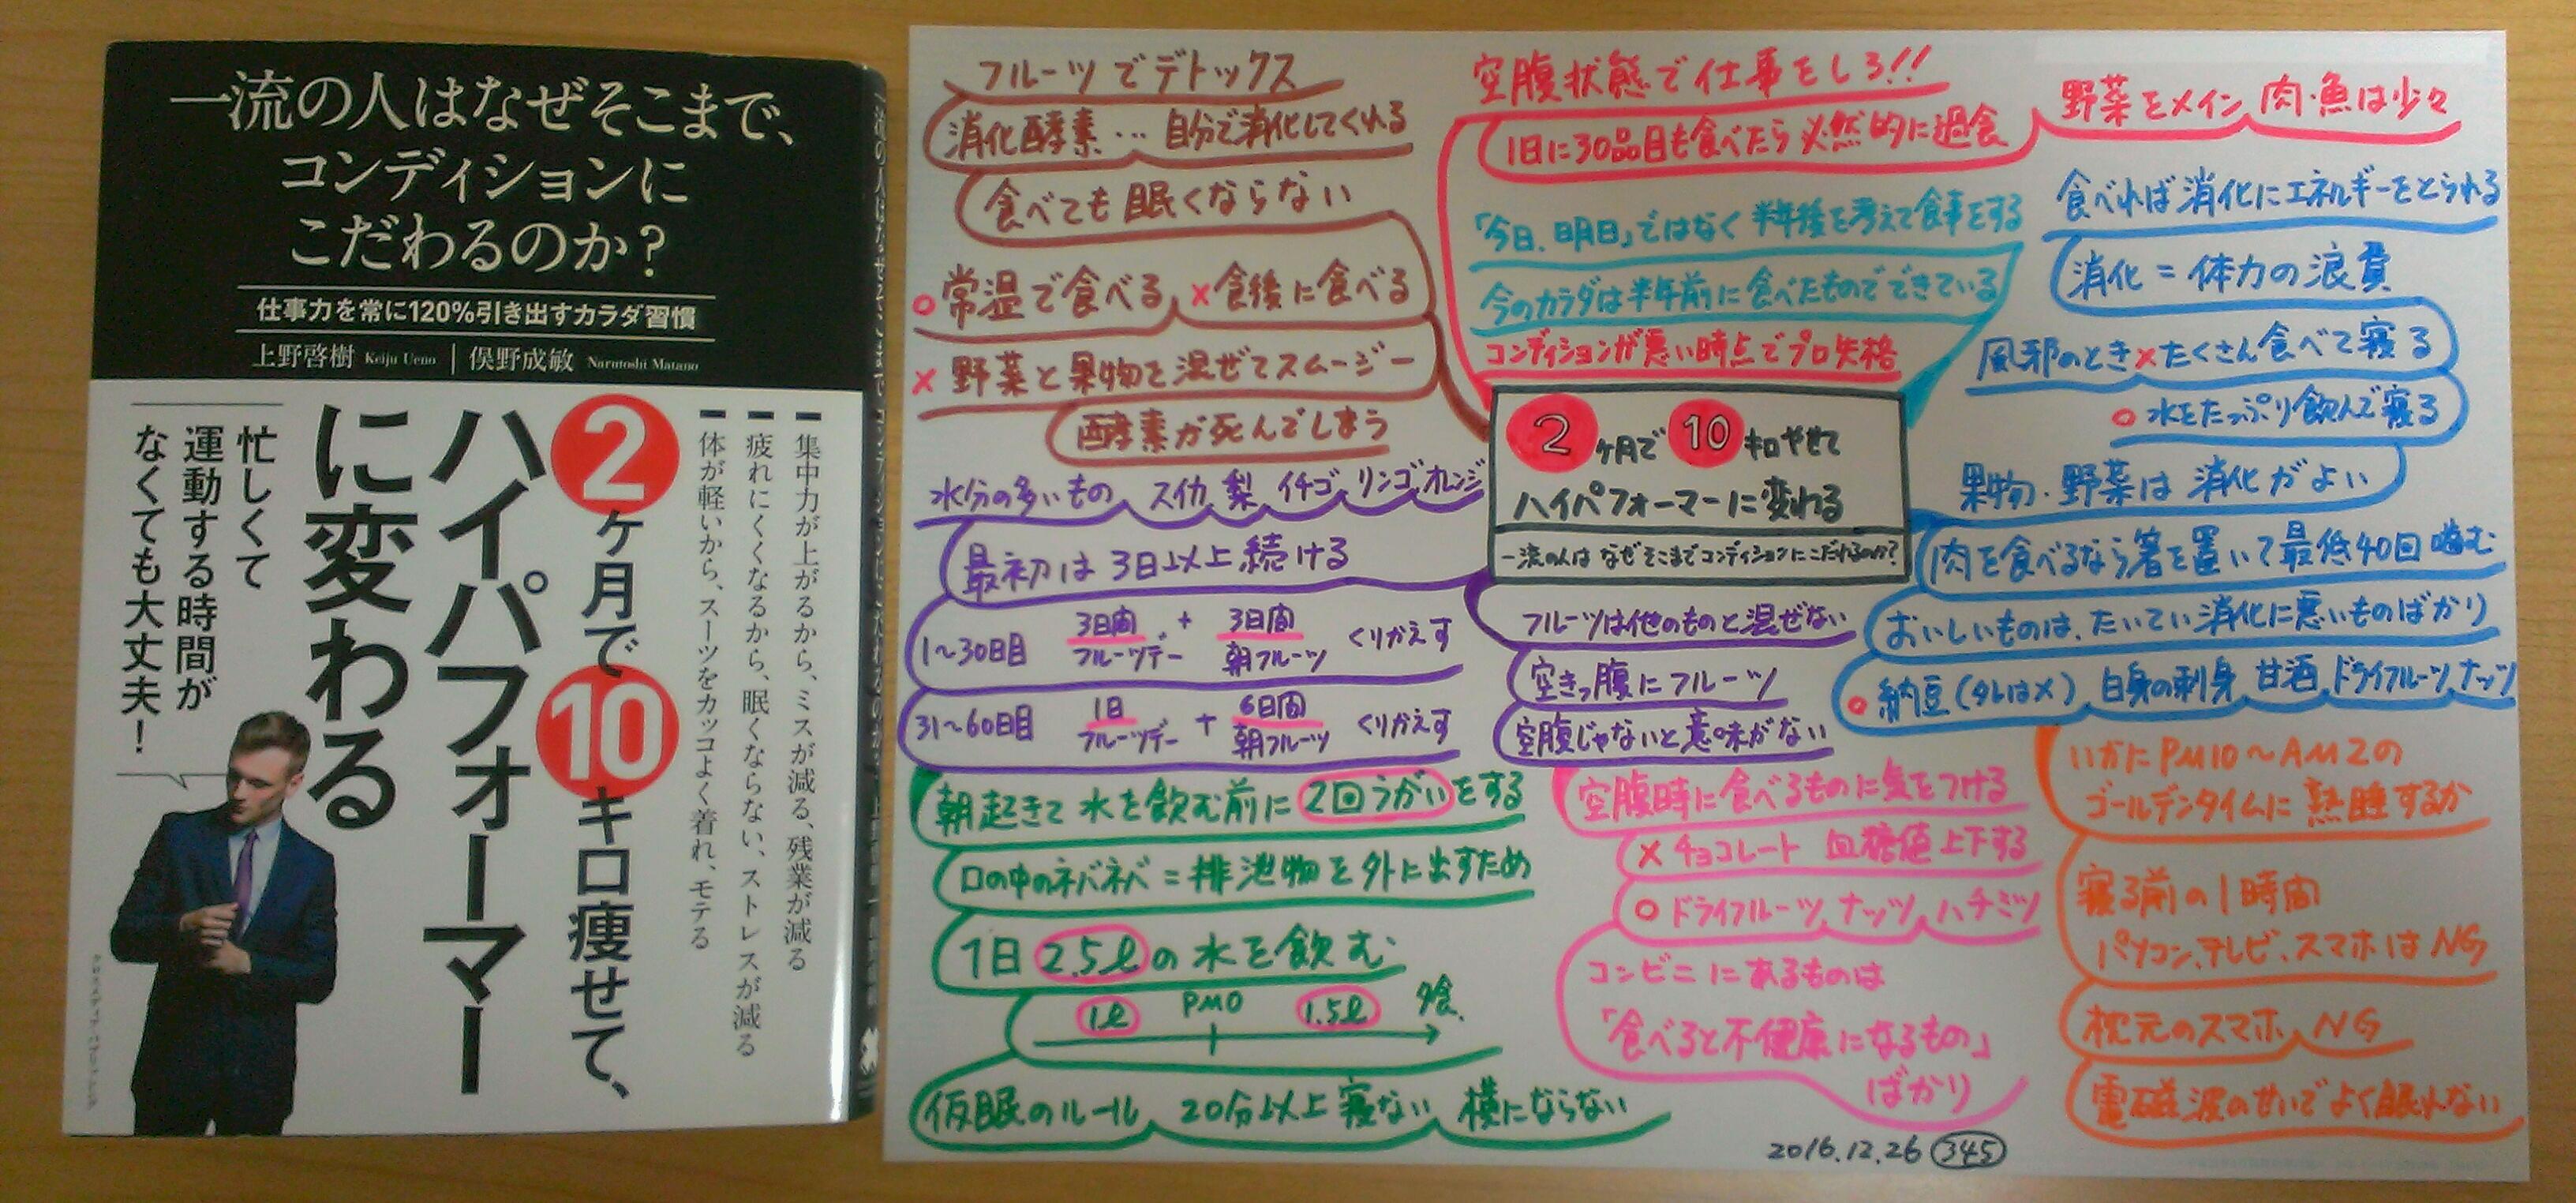 IMAG2515_1